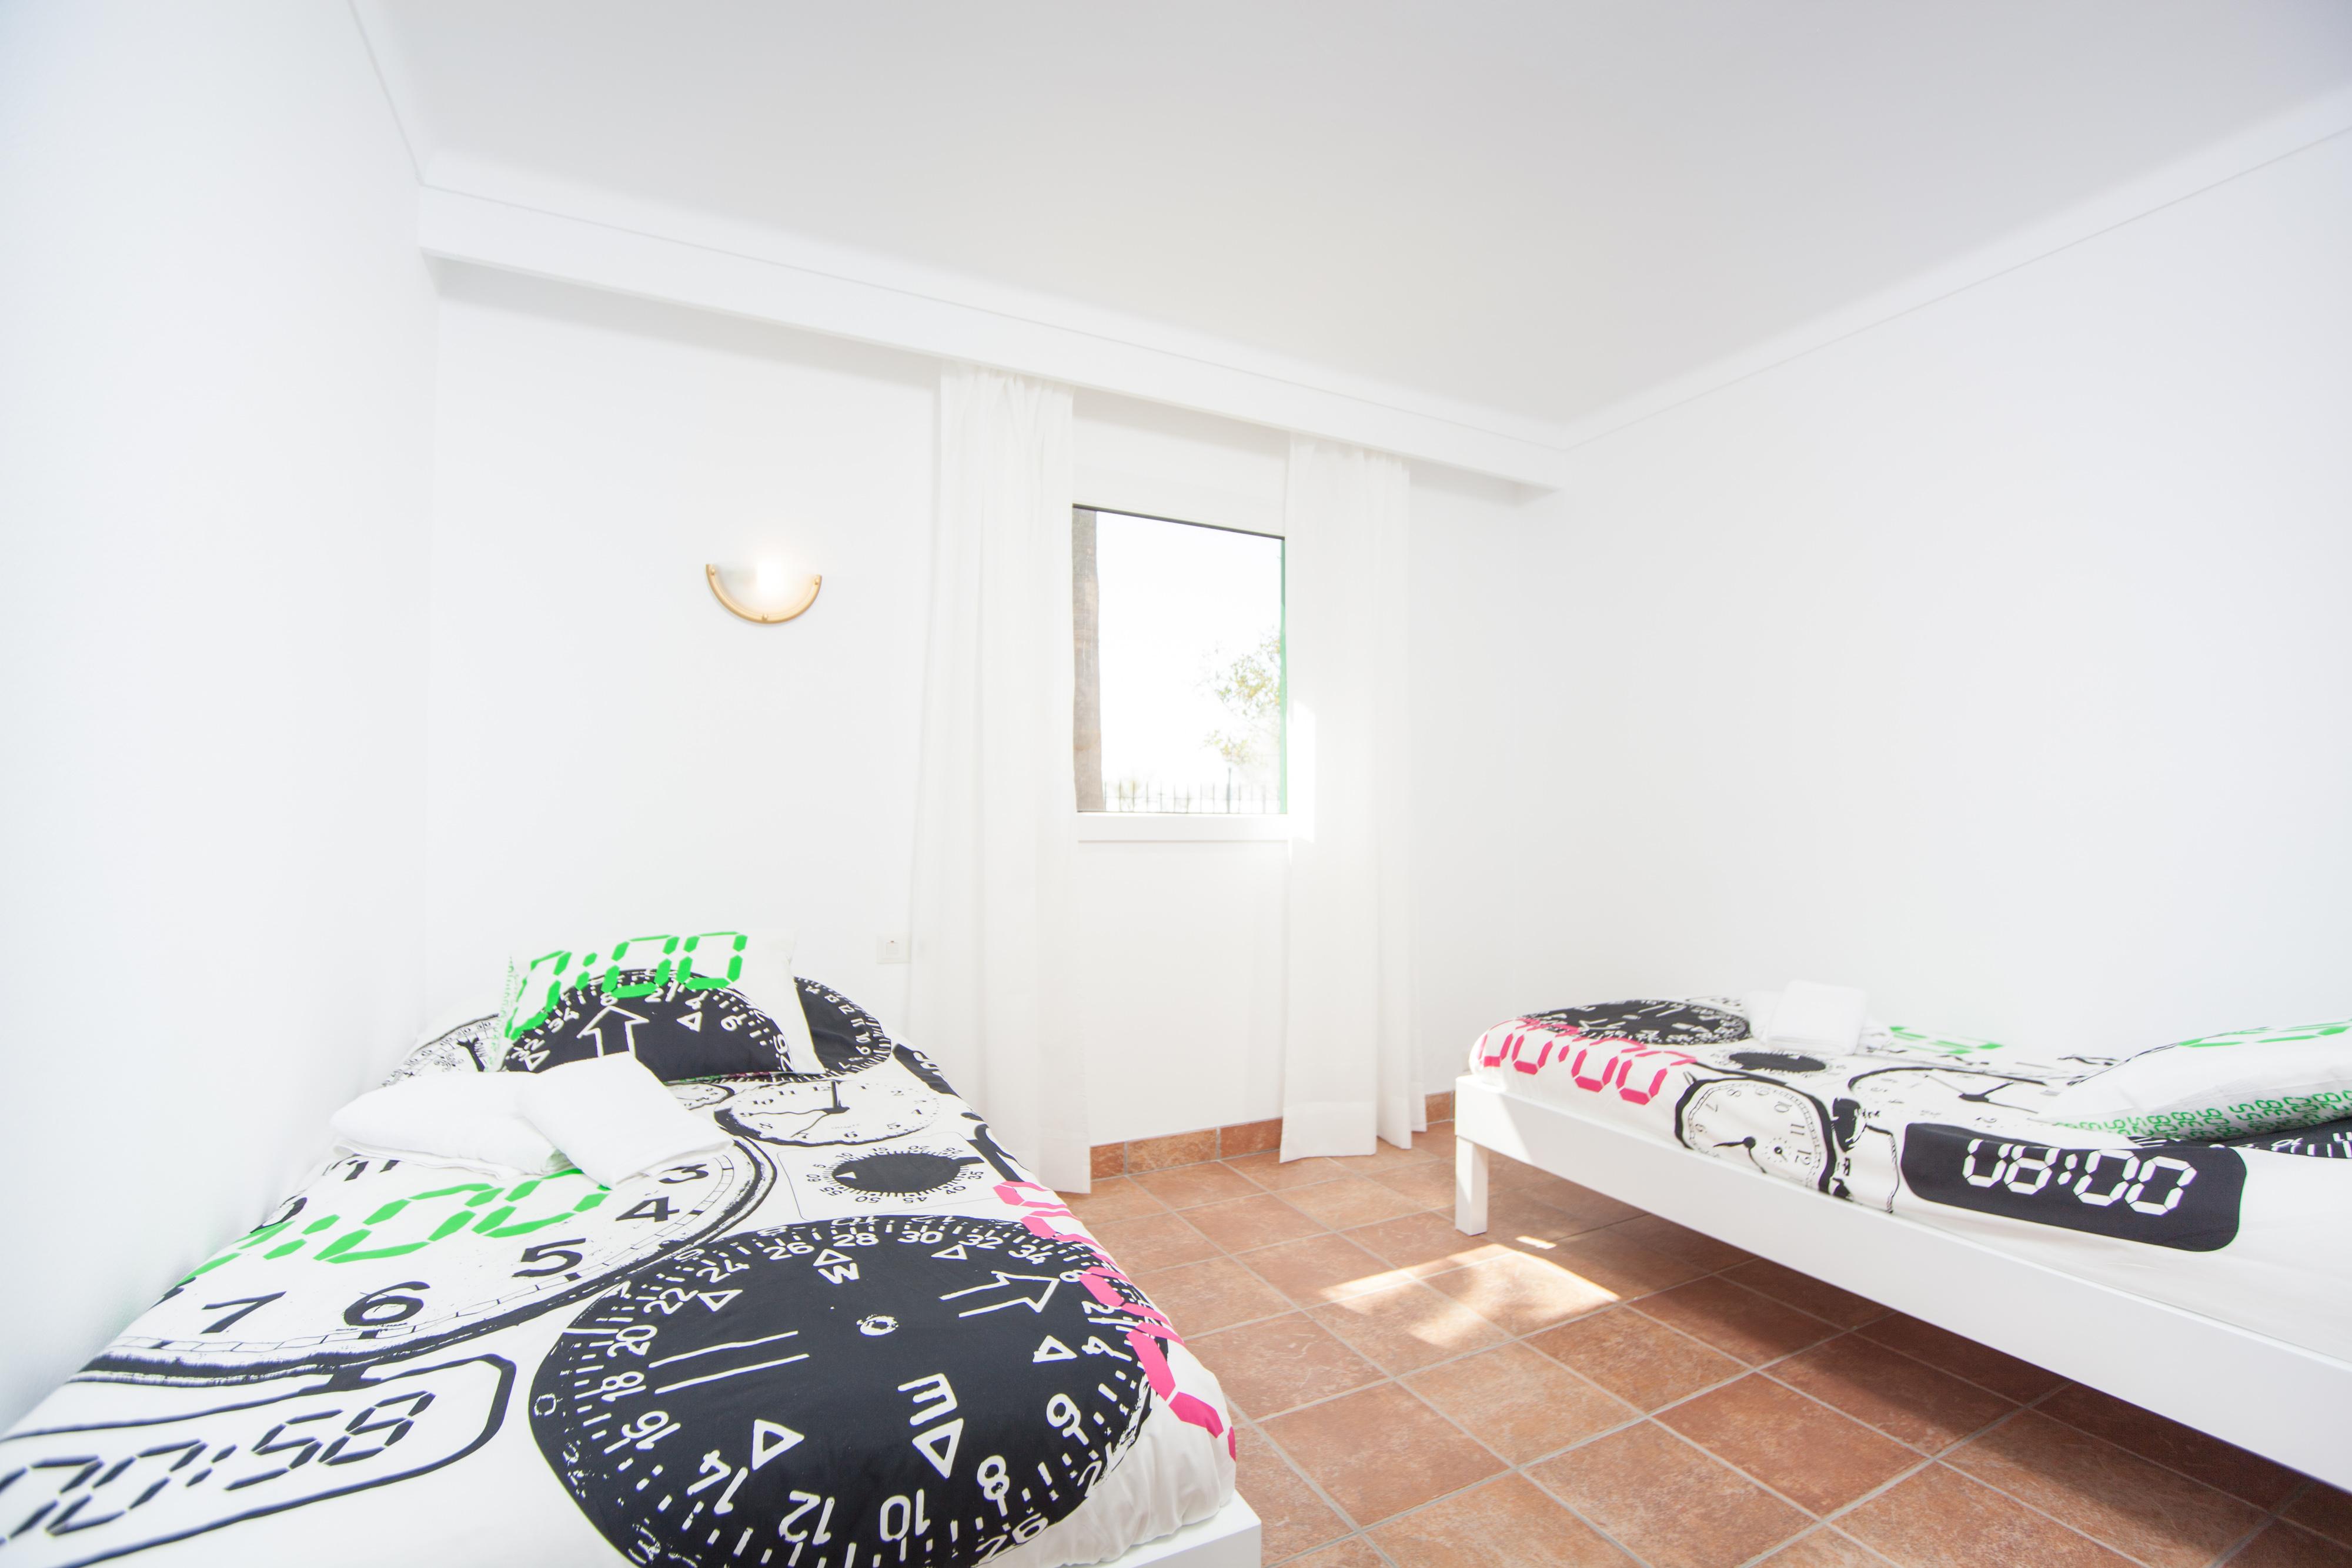 Ferienhaus RODRIGUEZ DE LA FUENTE 19 (SIN NOMBRE) (2144936), Platja de Muro, Mallorca, Balearische Inseln, Spanien, Bild 21